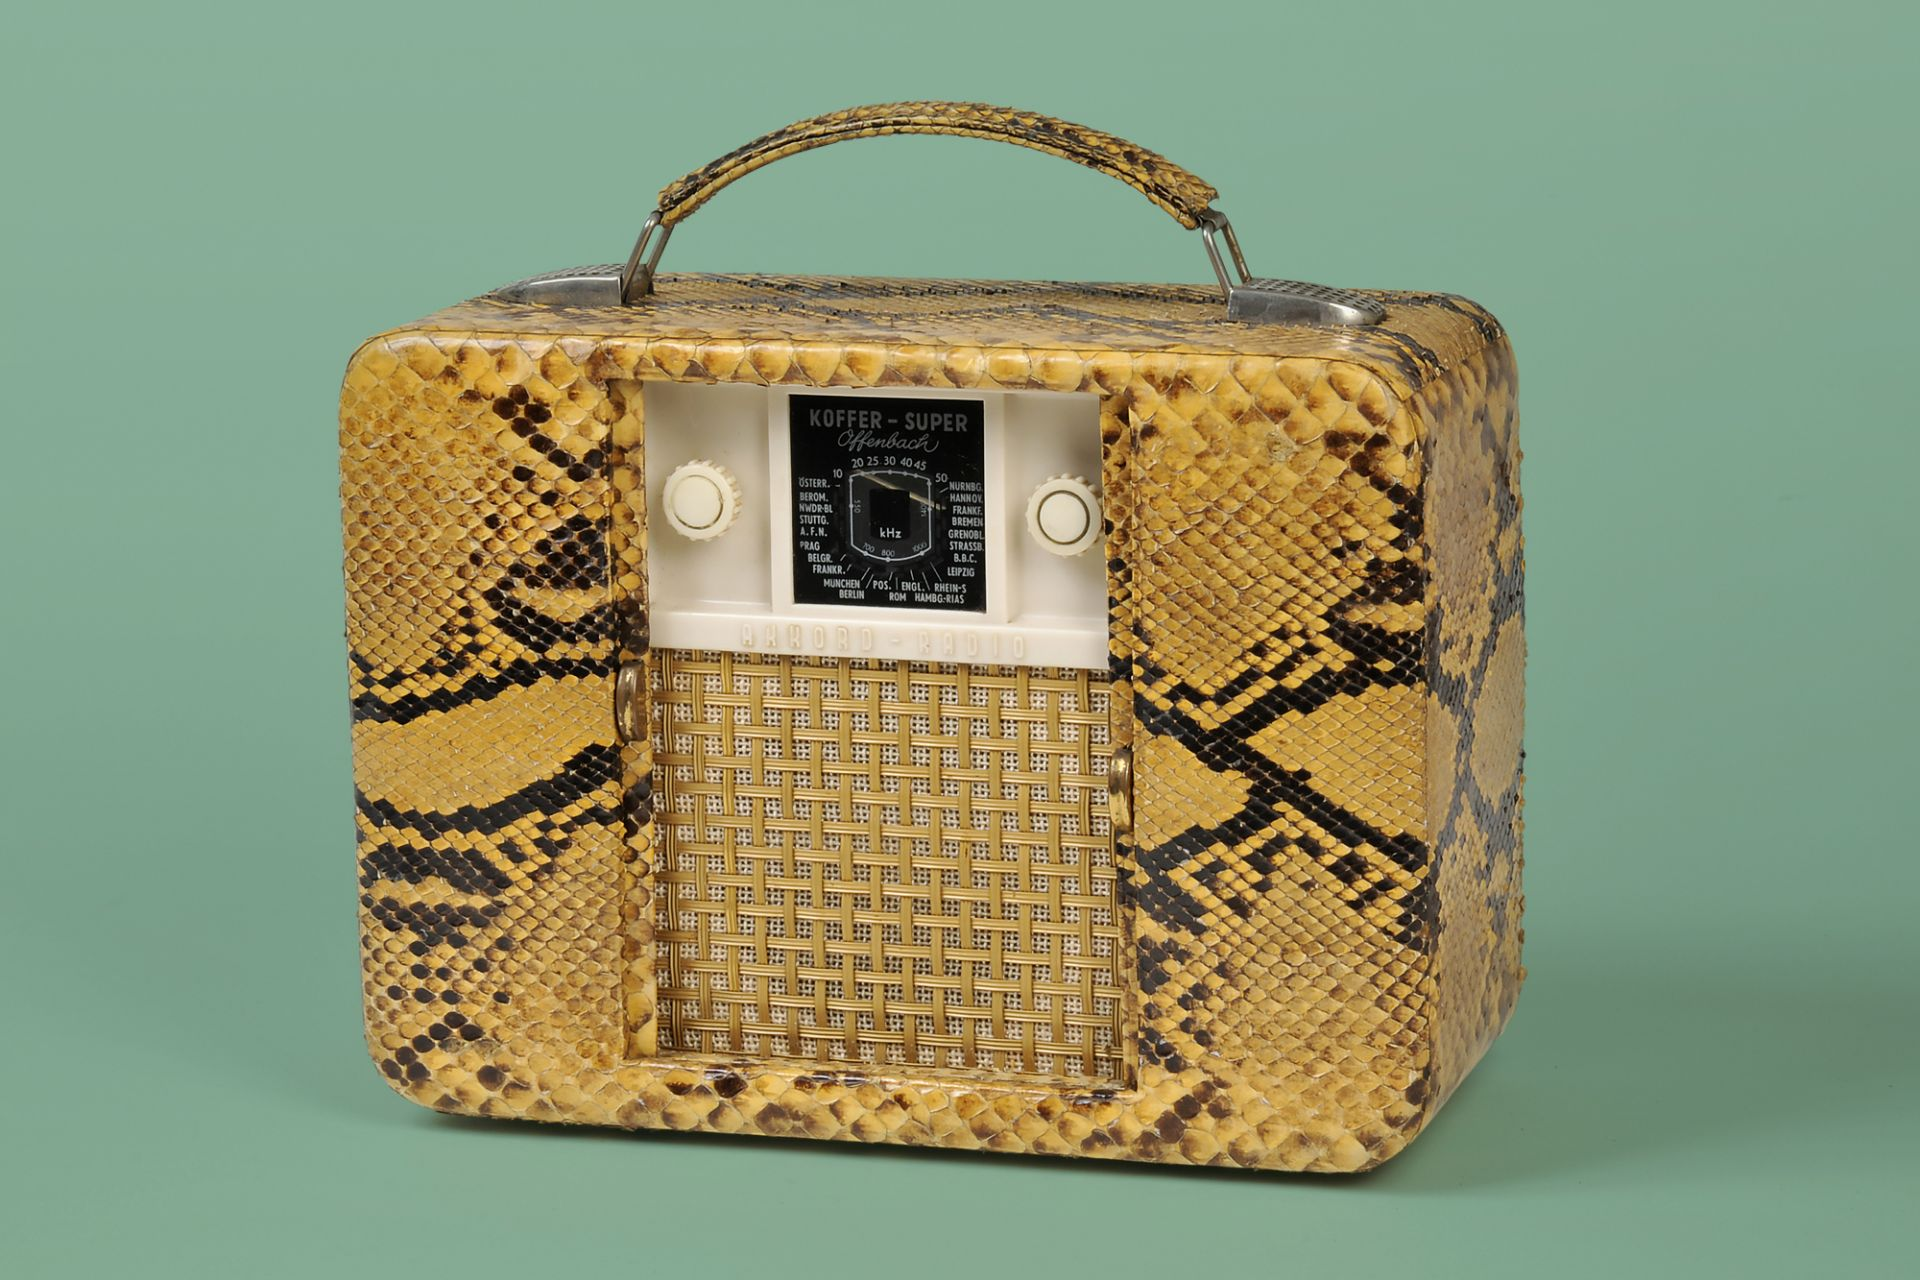 Kofferradio, Modell Offenbach 51, Offenbach, 1951